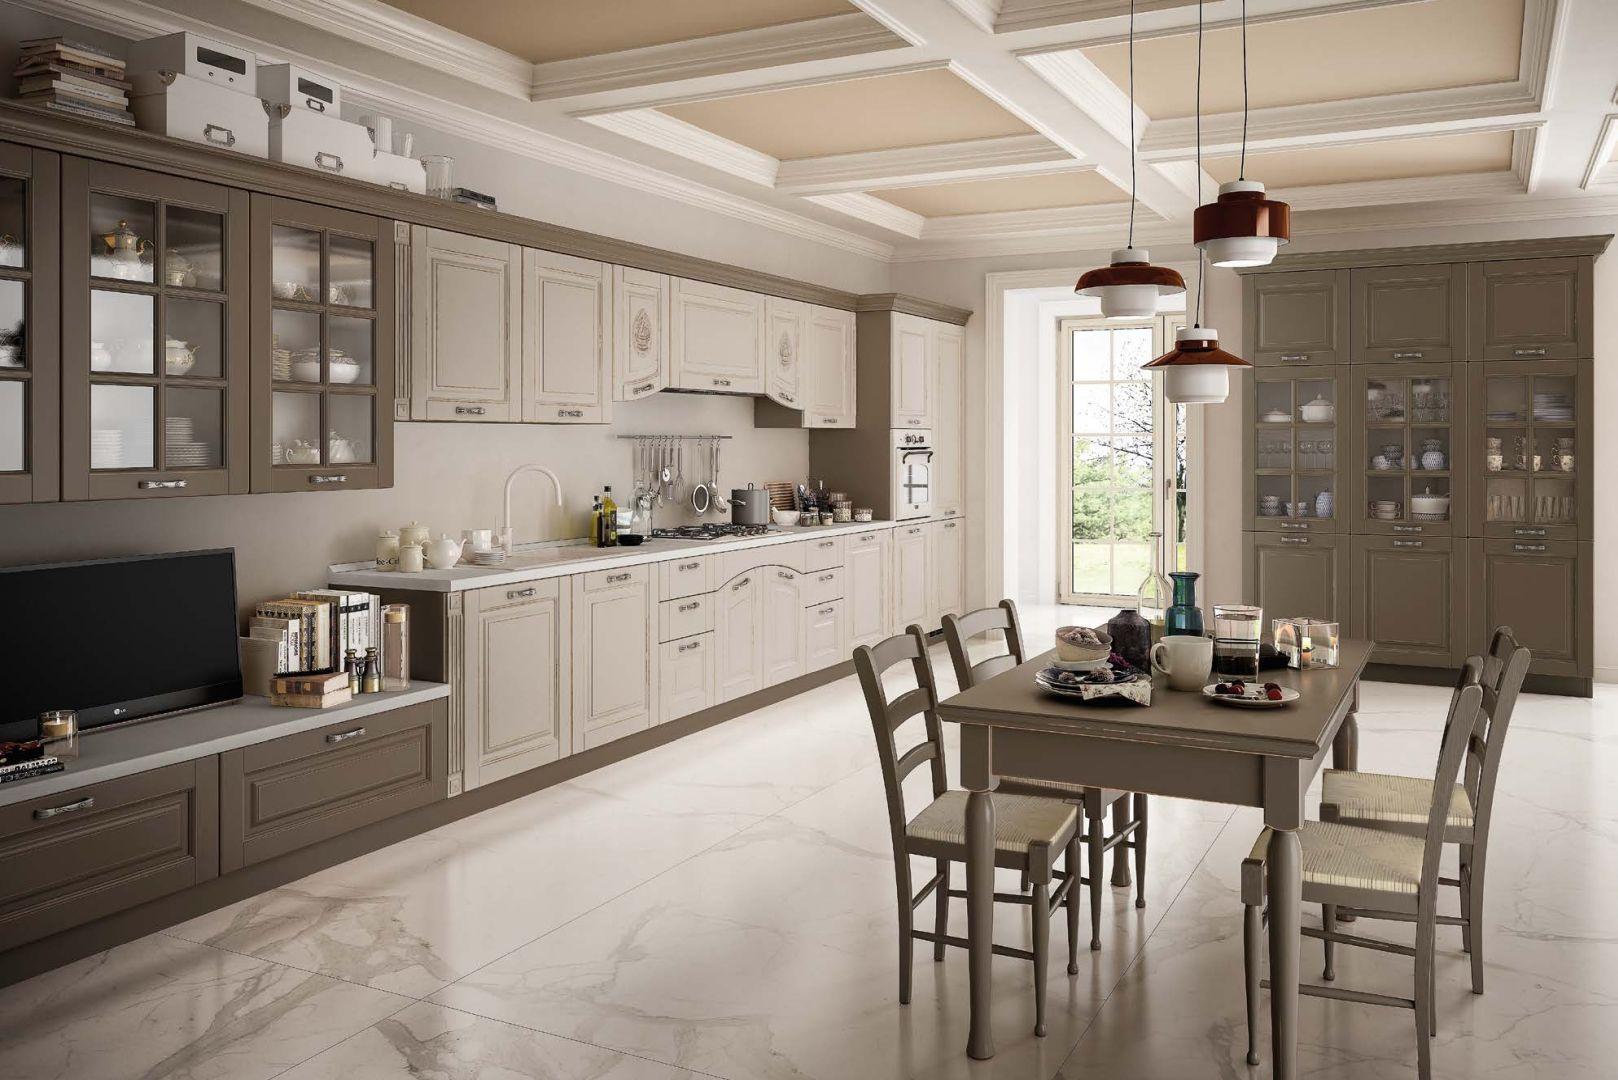 SOFIA μασίφ κουζίνα λαδί με ξέβγαλμα και λευκό ντεκαπέ